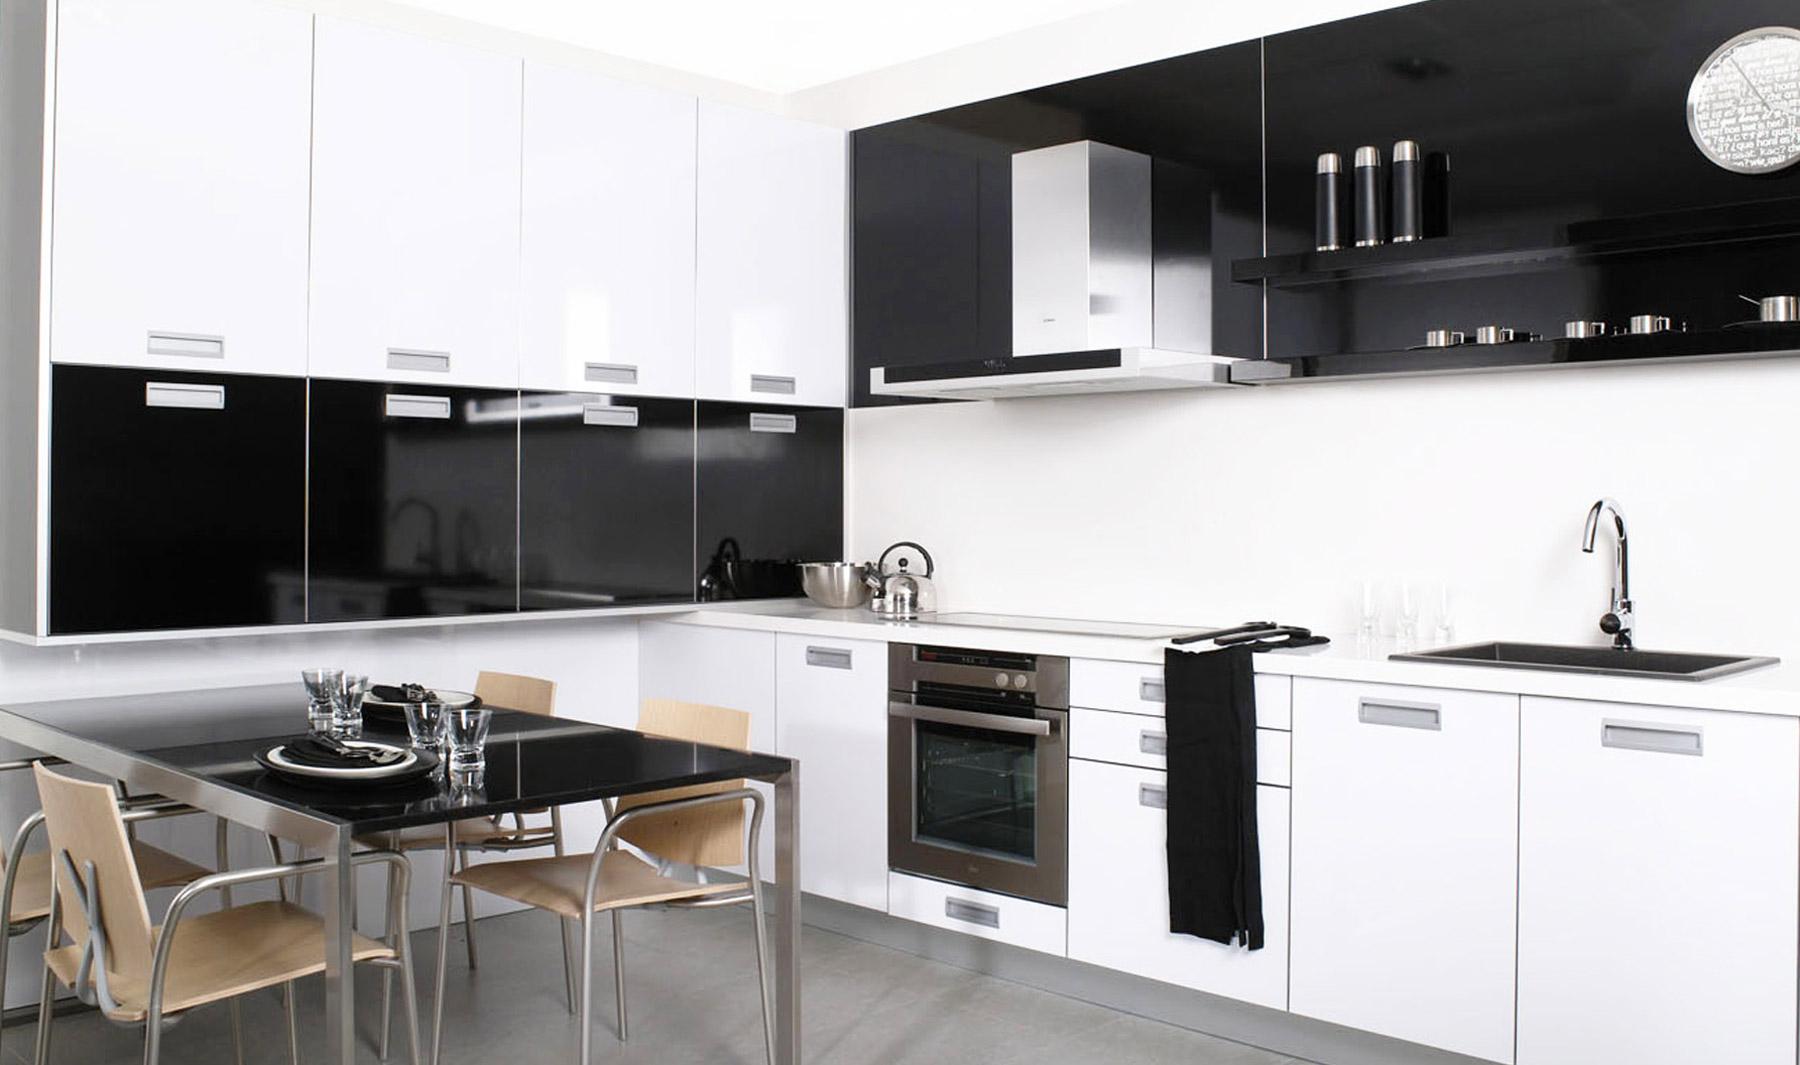 Cocinas integrales modernas para espacios peque os for Diseno y decoracion de cocinas